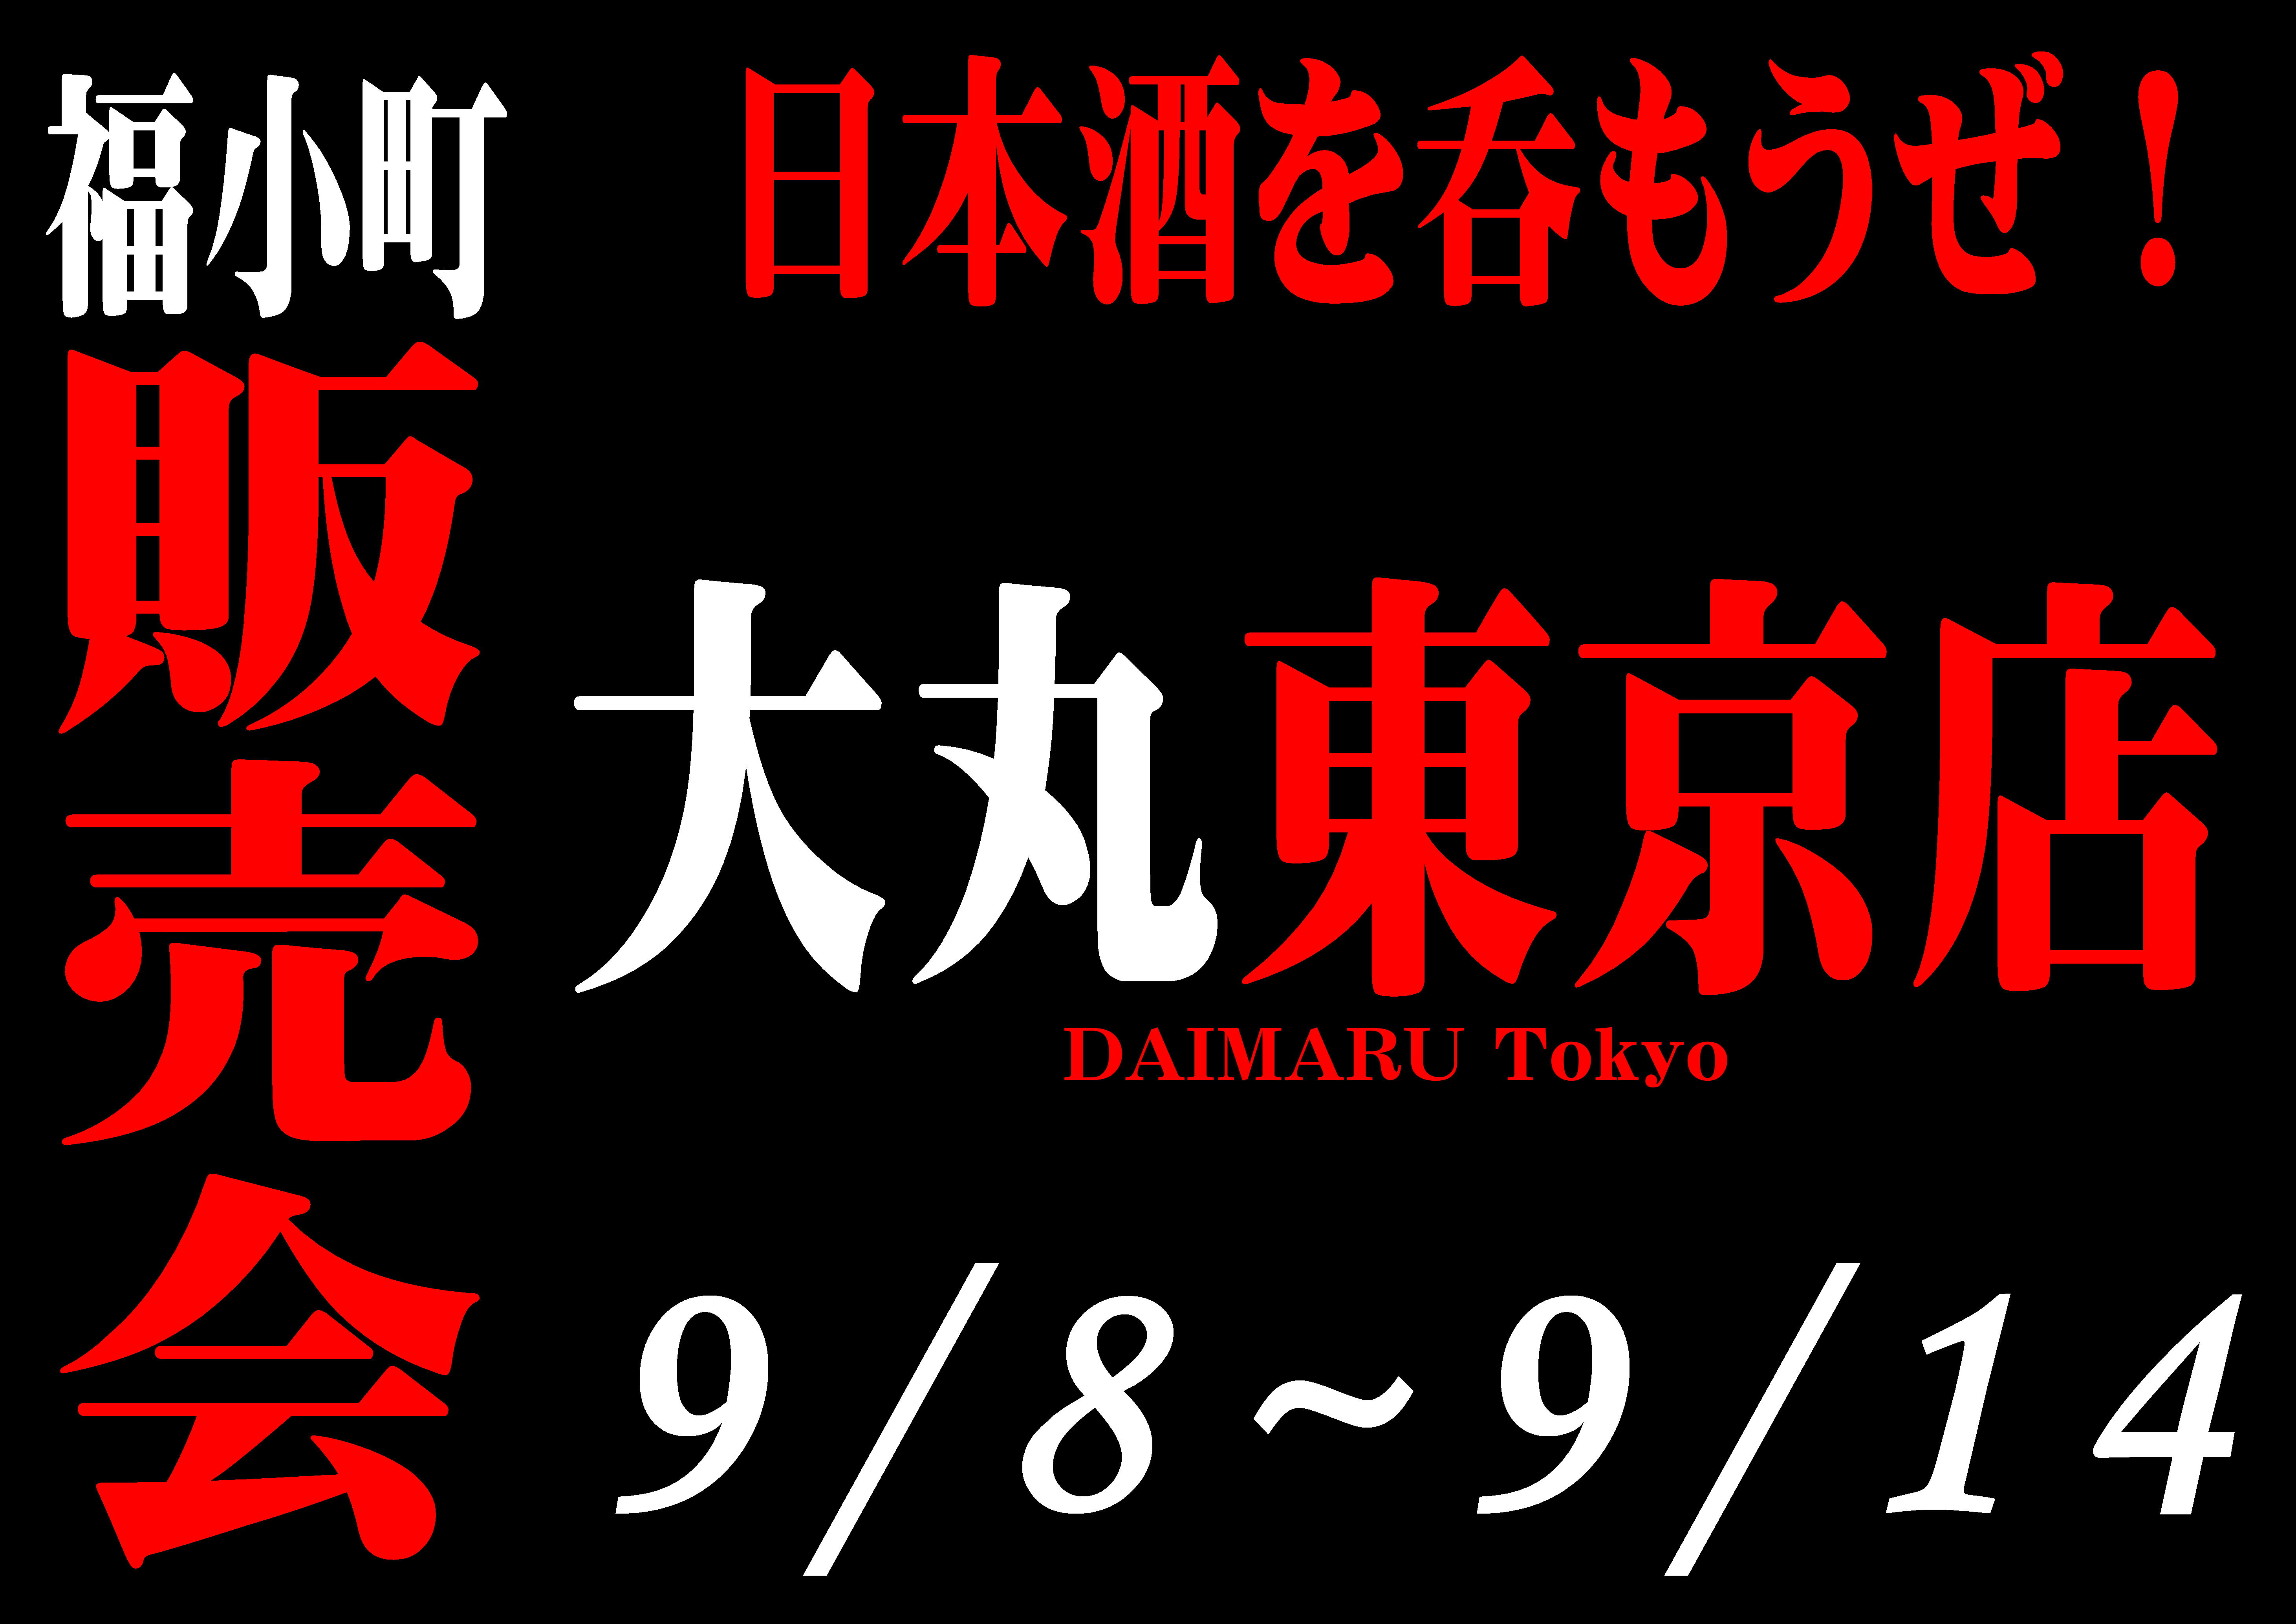 http://www.fukukomachi.com/blog/photo/20210908-2.JPG